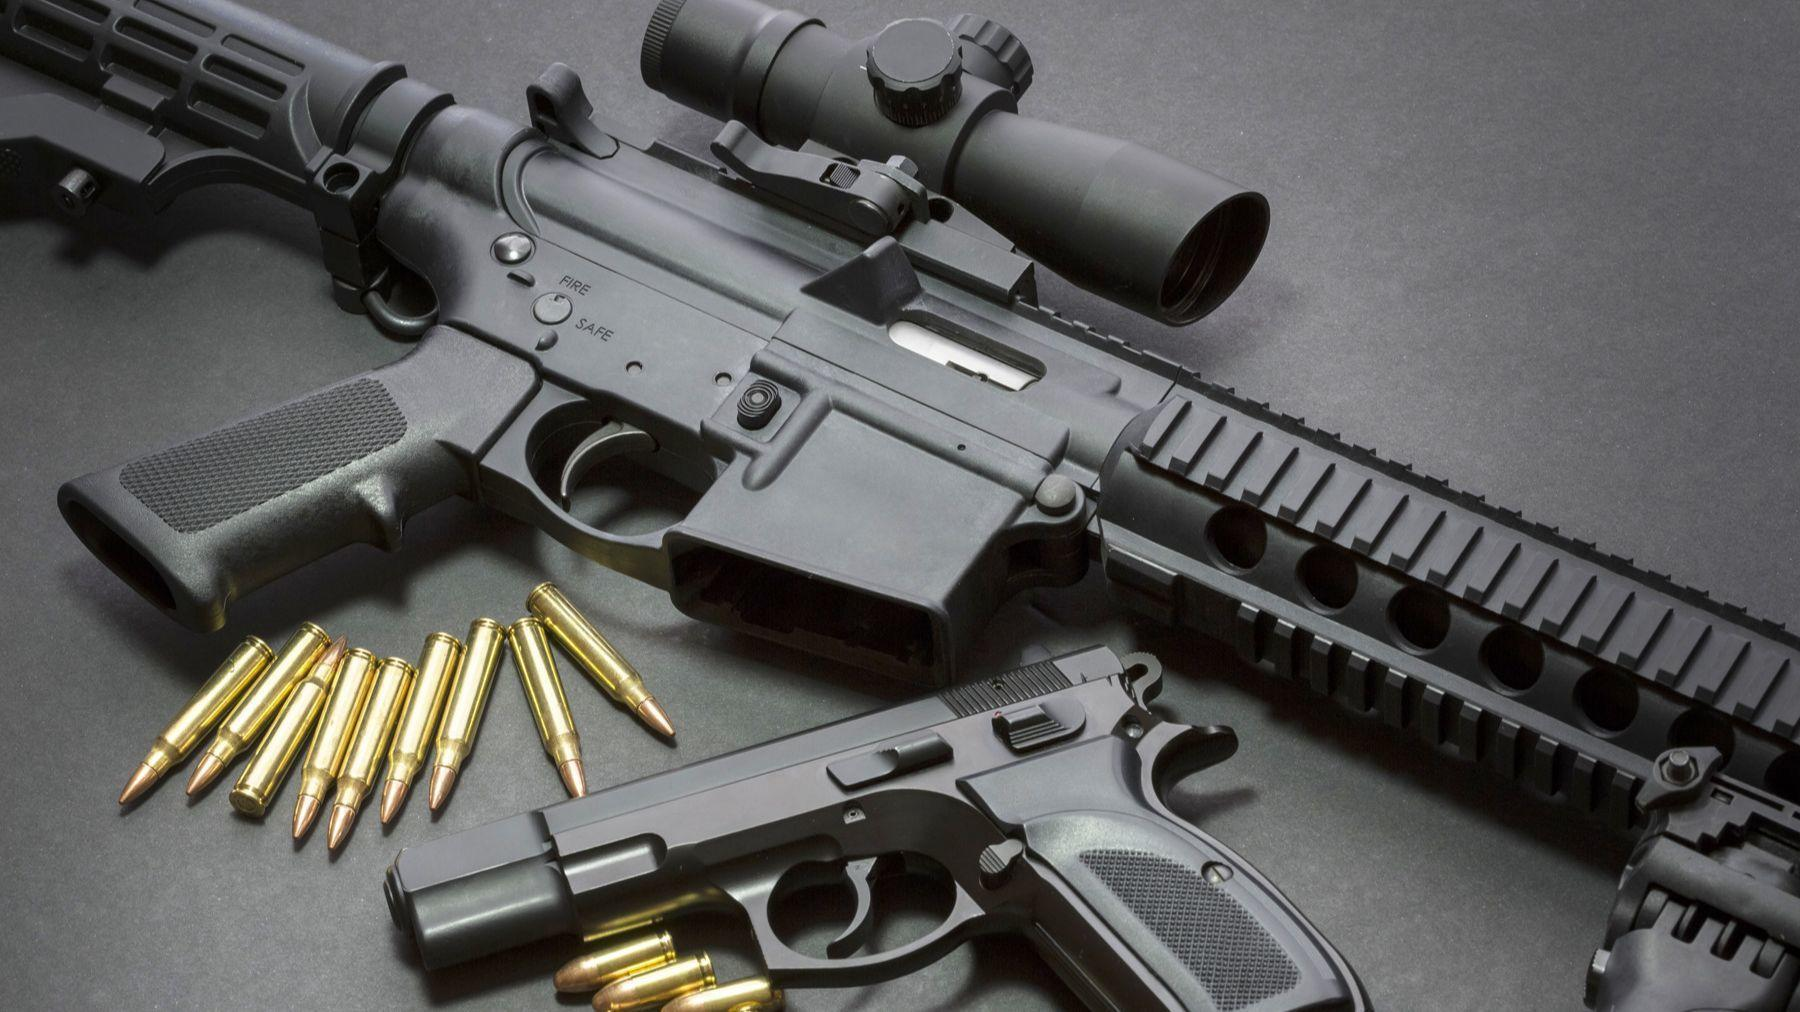 Gun Advocate Shares Views On California U0026 39 S Ownership Laws